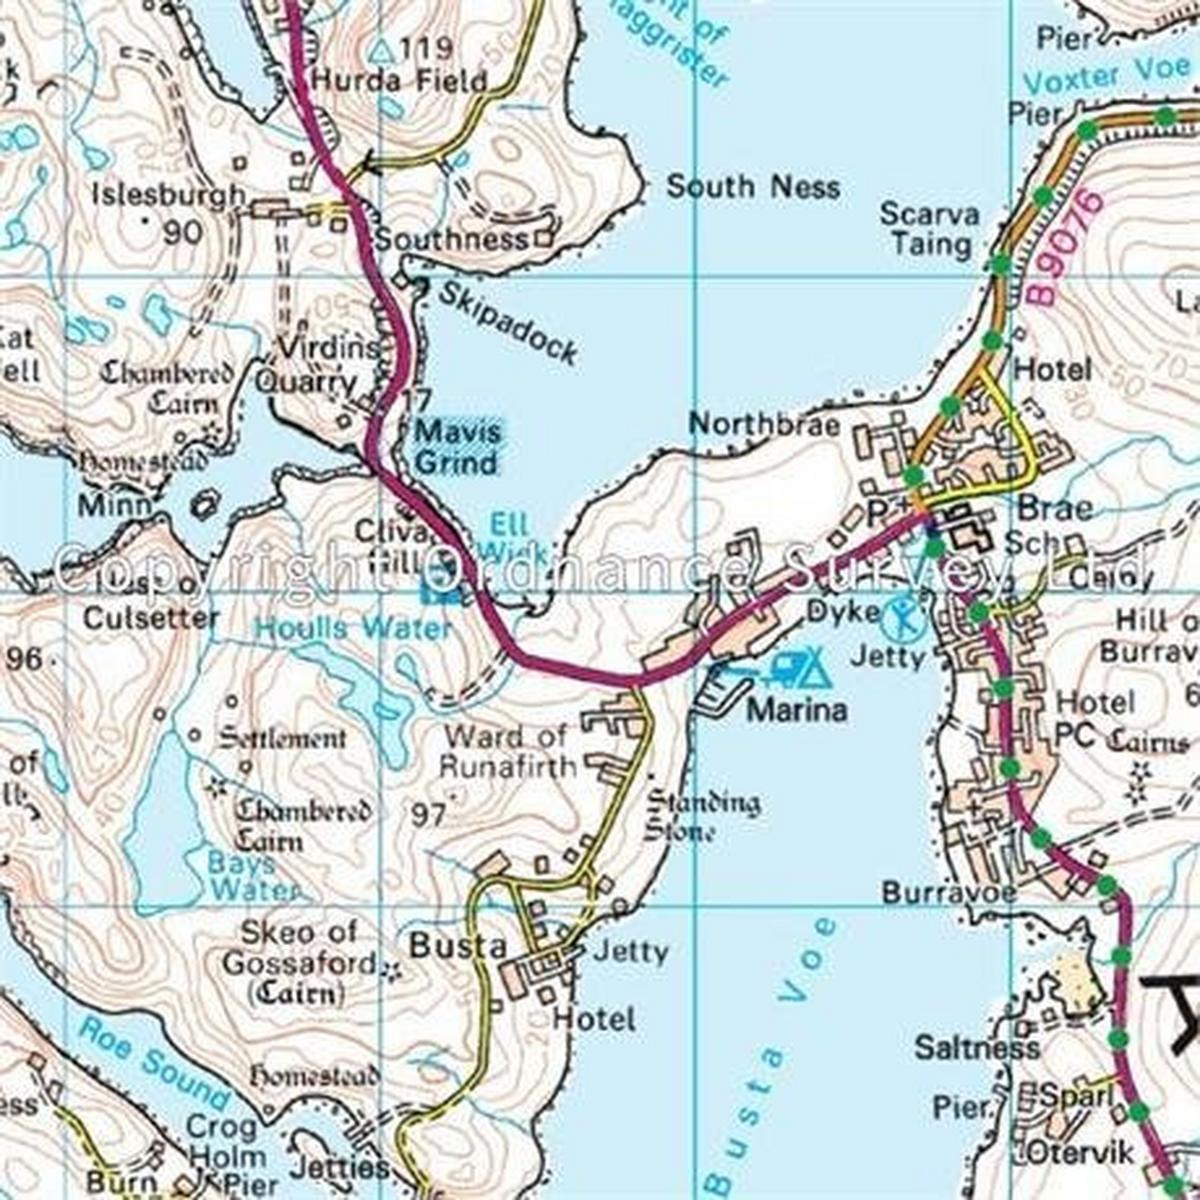 Ordnance Survey OS Landranger Map 03 Shetland - North Mainland